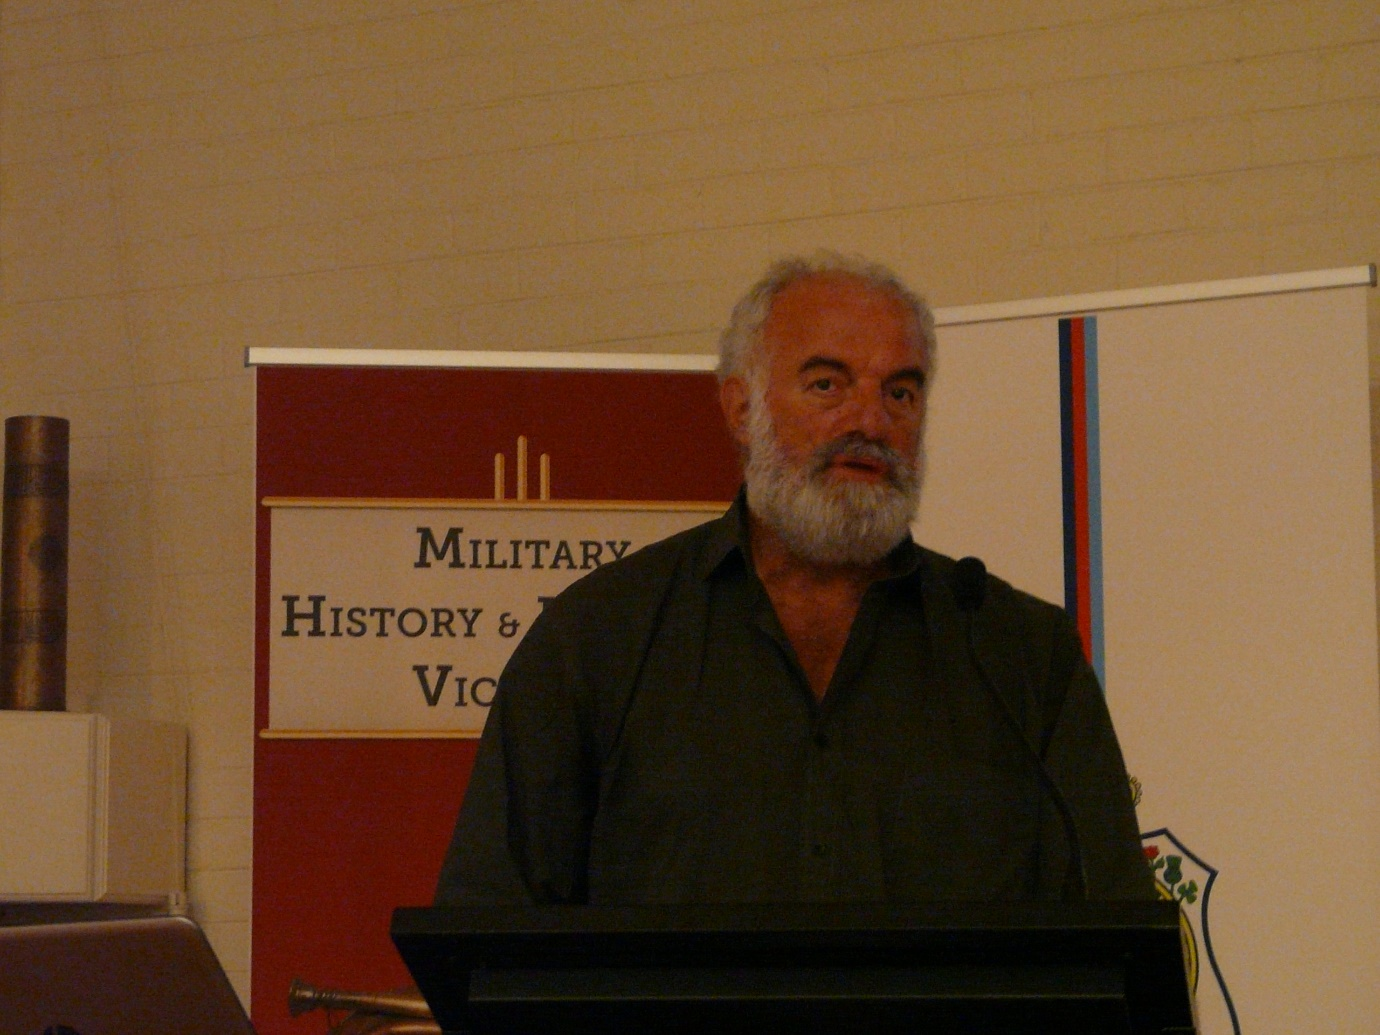 Lambis Englezos presenting at the MHHV